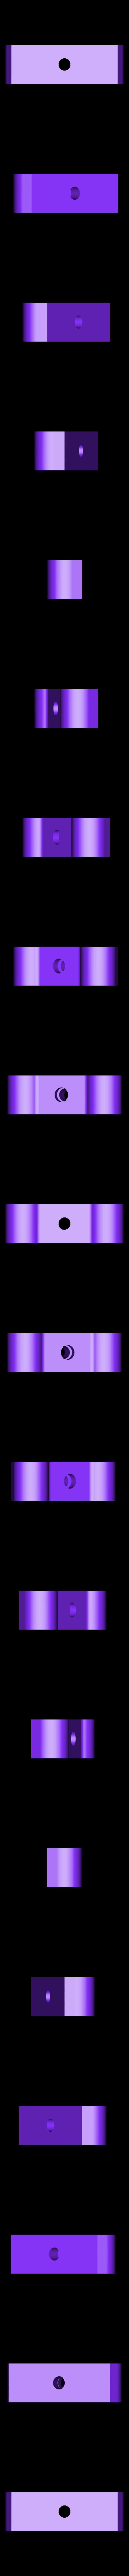 Clamp-slide.STL Télécharger fichier STL gratuit Clamp for vertical use. Photo and video shooting • Plan pour impression 3D, perinski